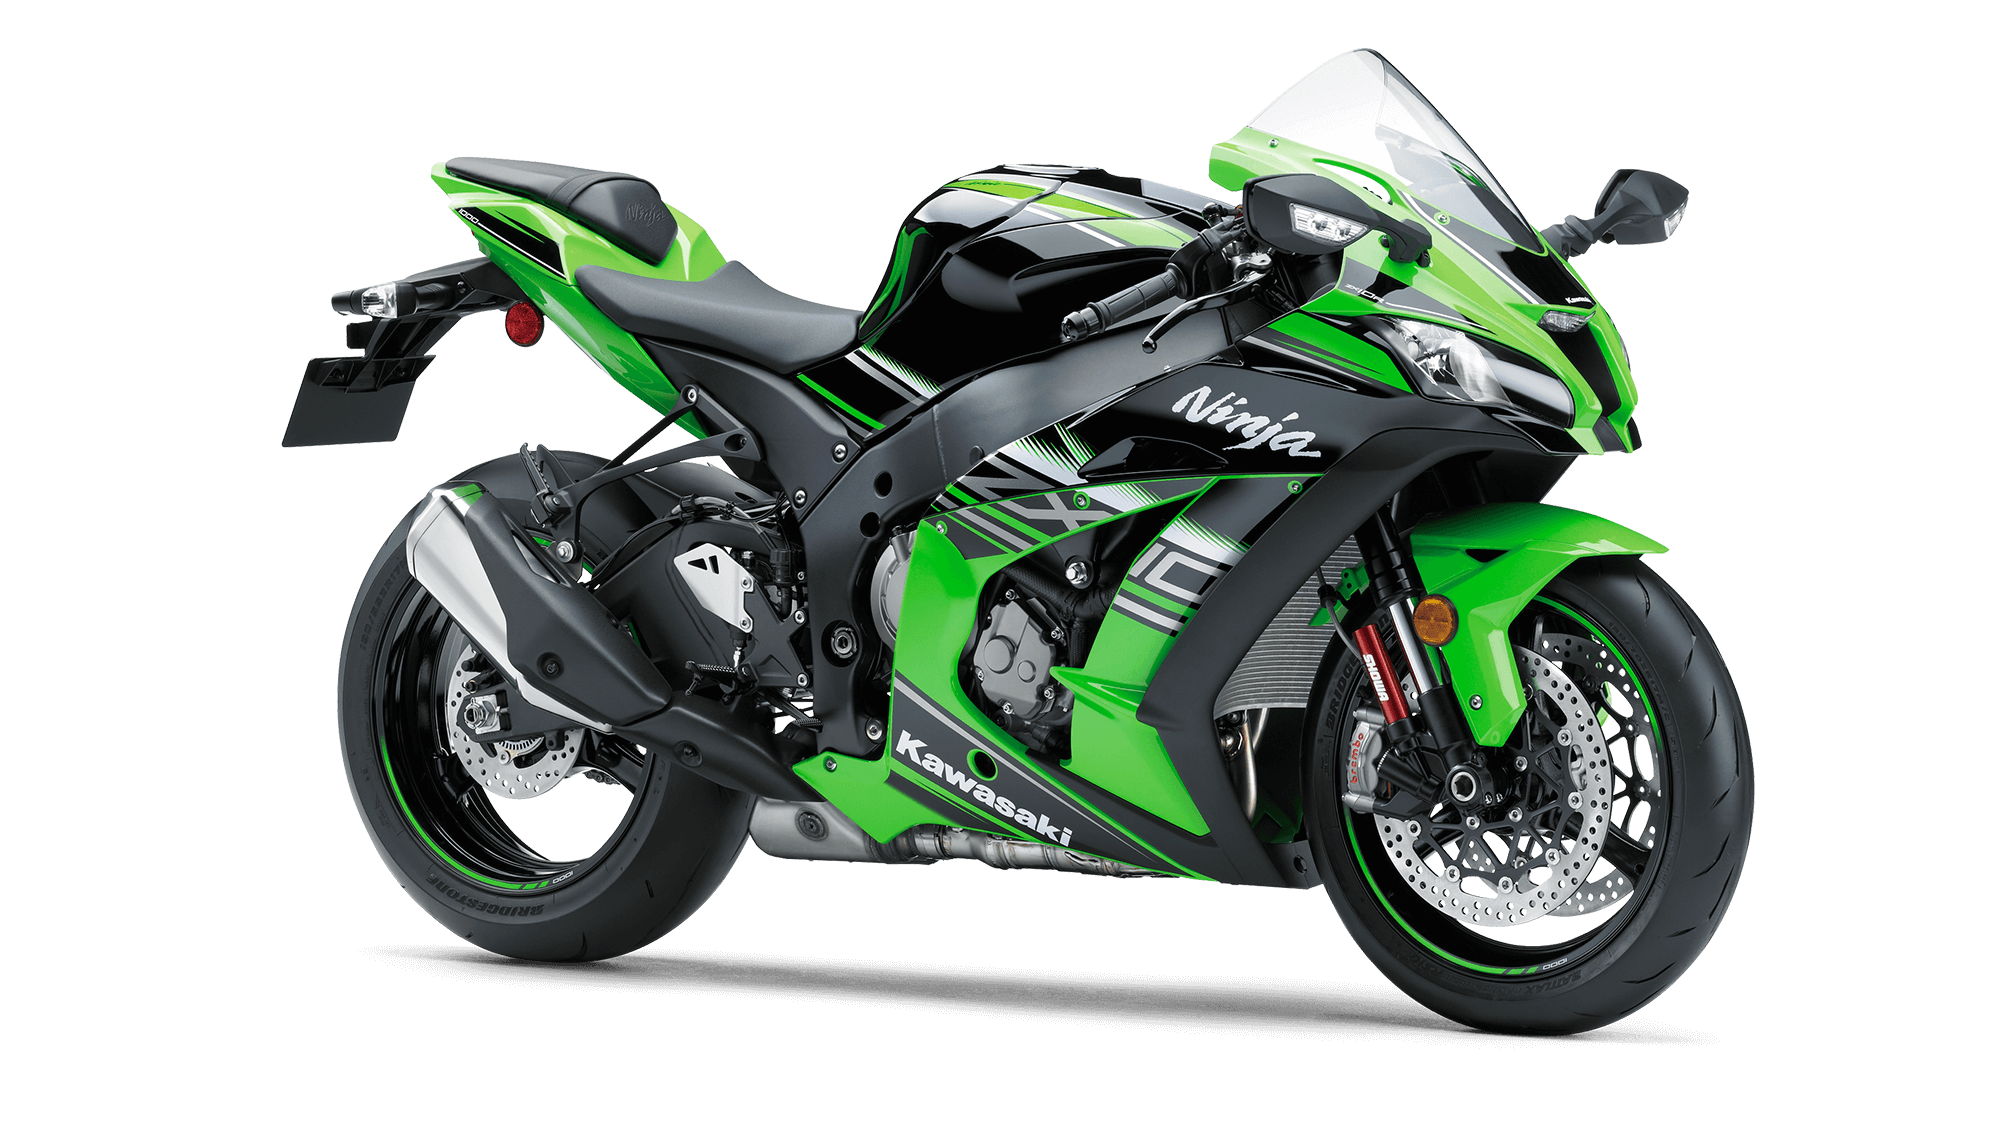 2016 ninja® zx™-10r abs krt edition supersport motorcycle